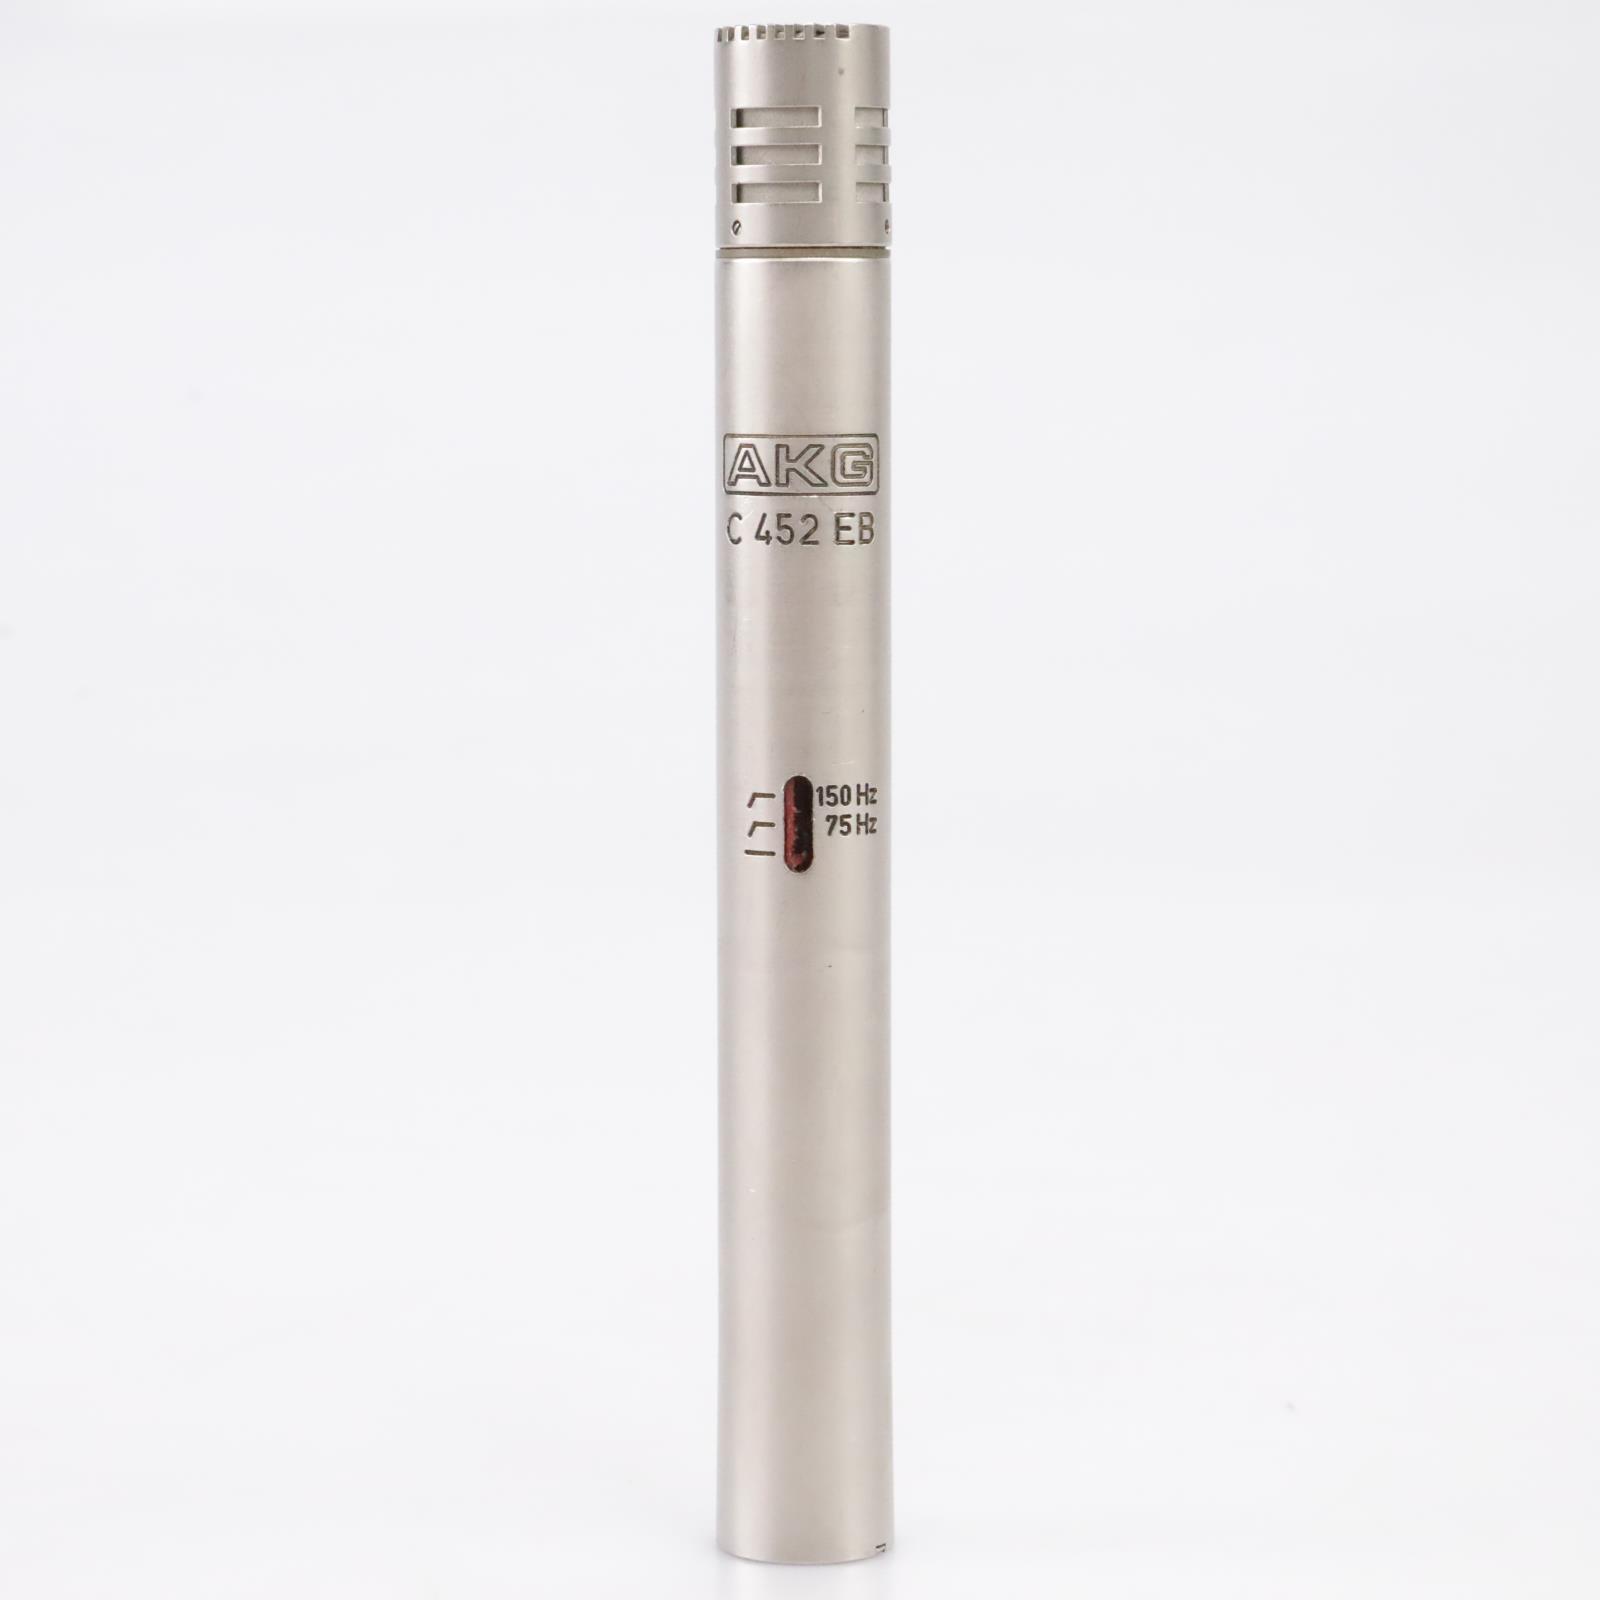 AKG C452EB Condenser Microphone CK1 Capsule w/ Sennheiser Mic Clip #43709